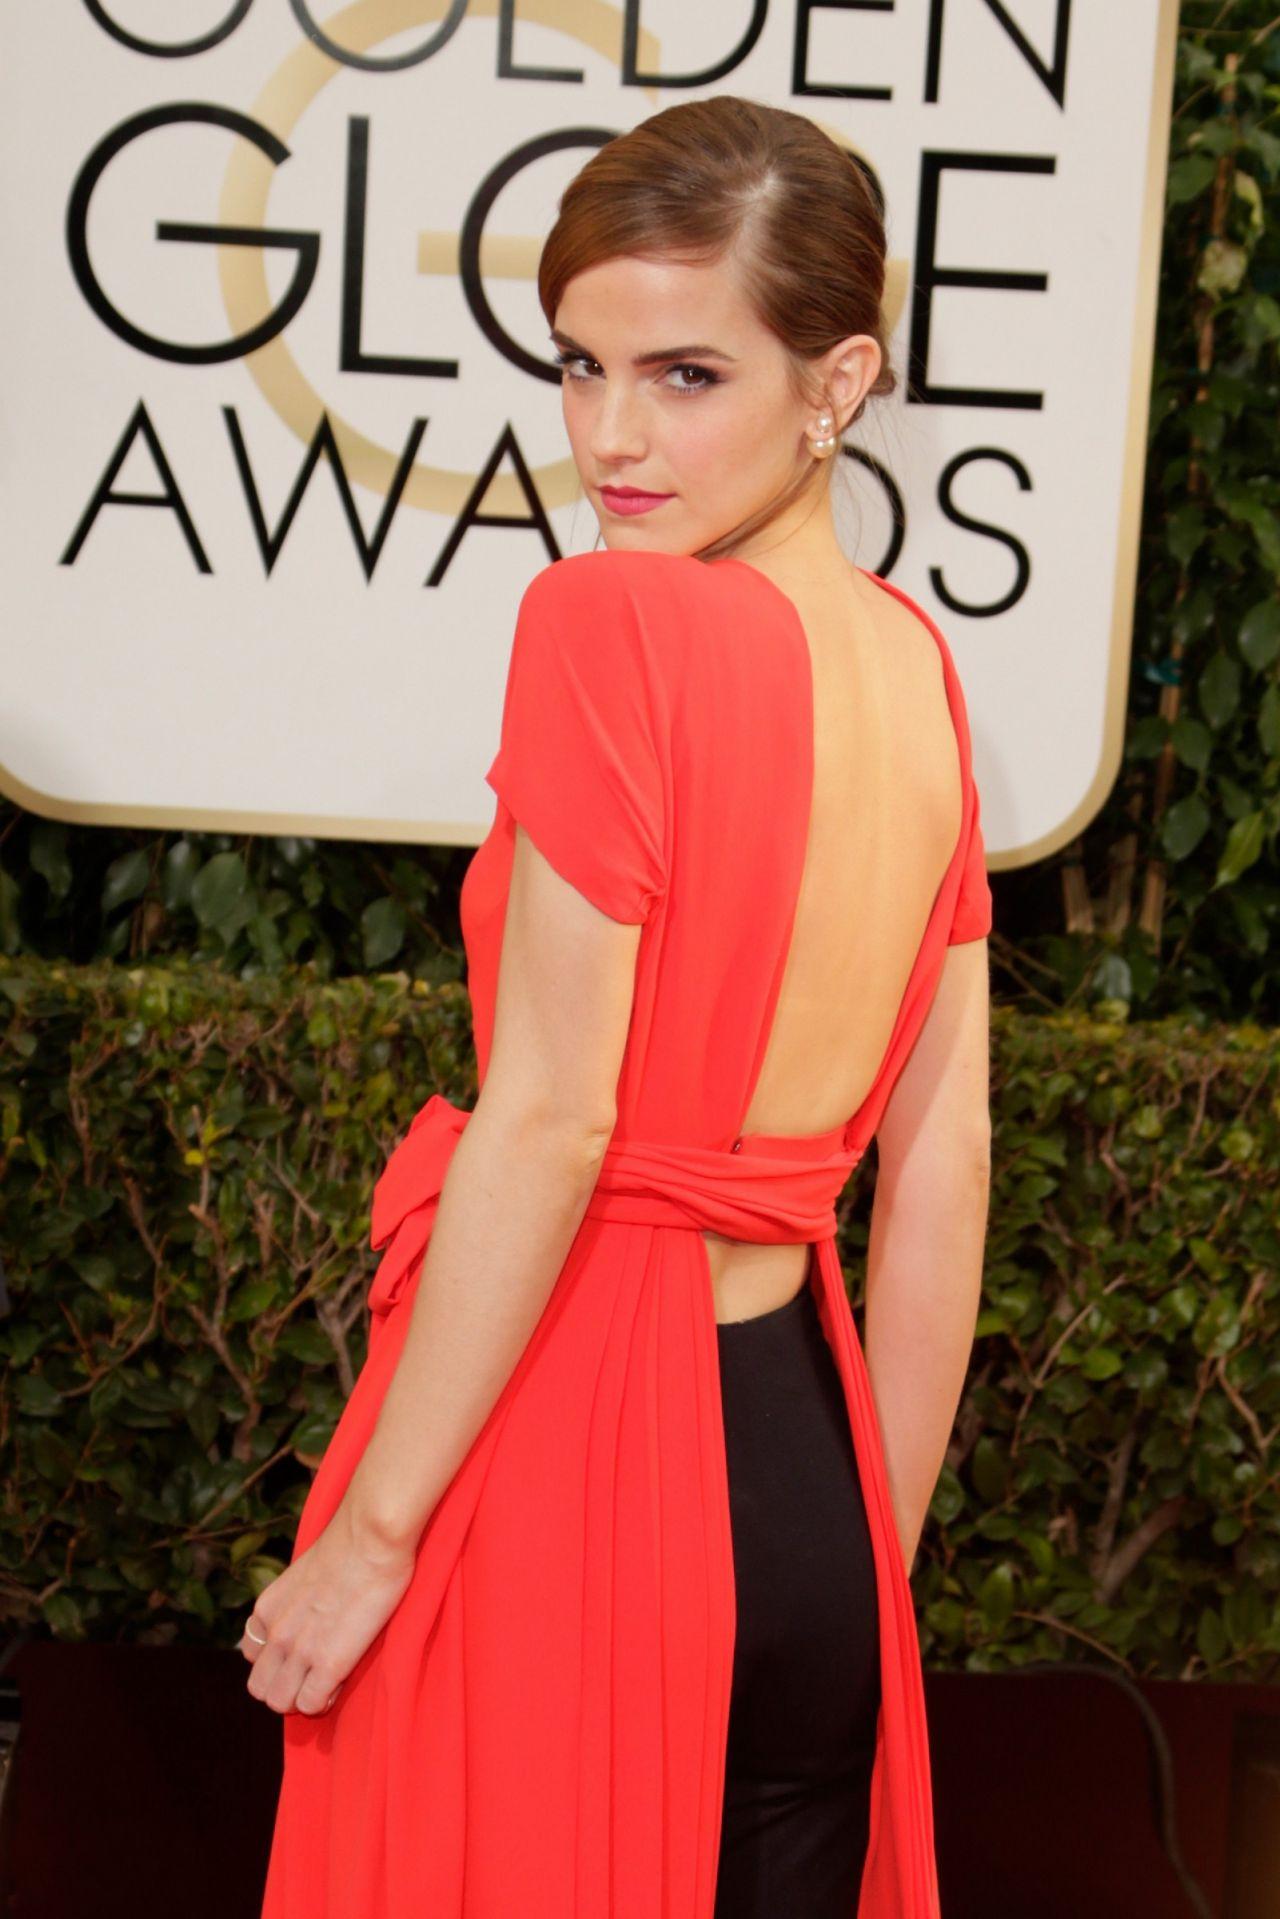 Emma watson wears christian dior couture at 2014 golden globe awards